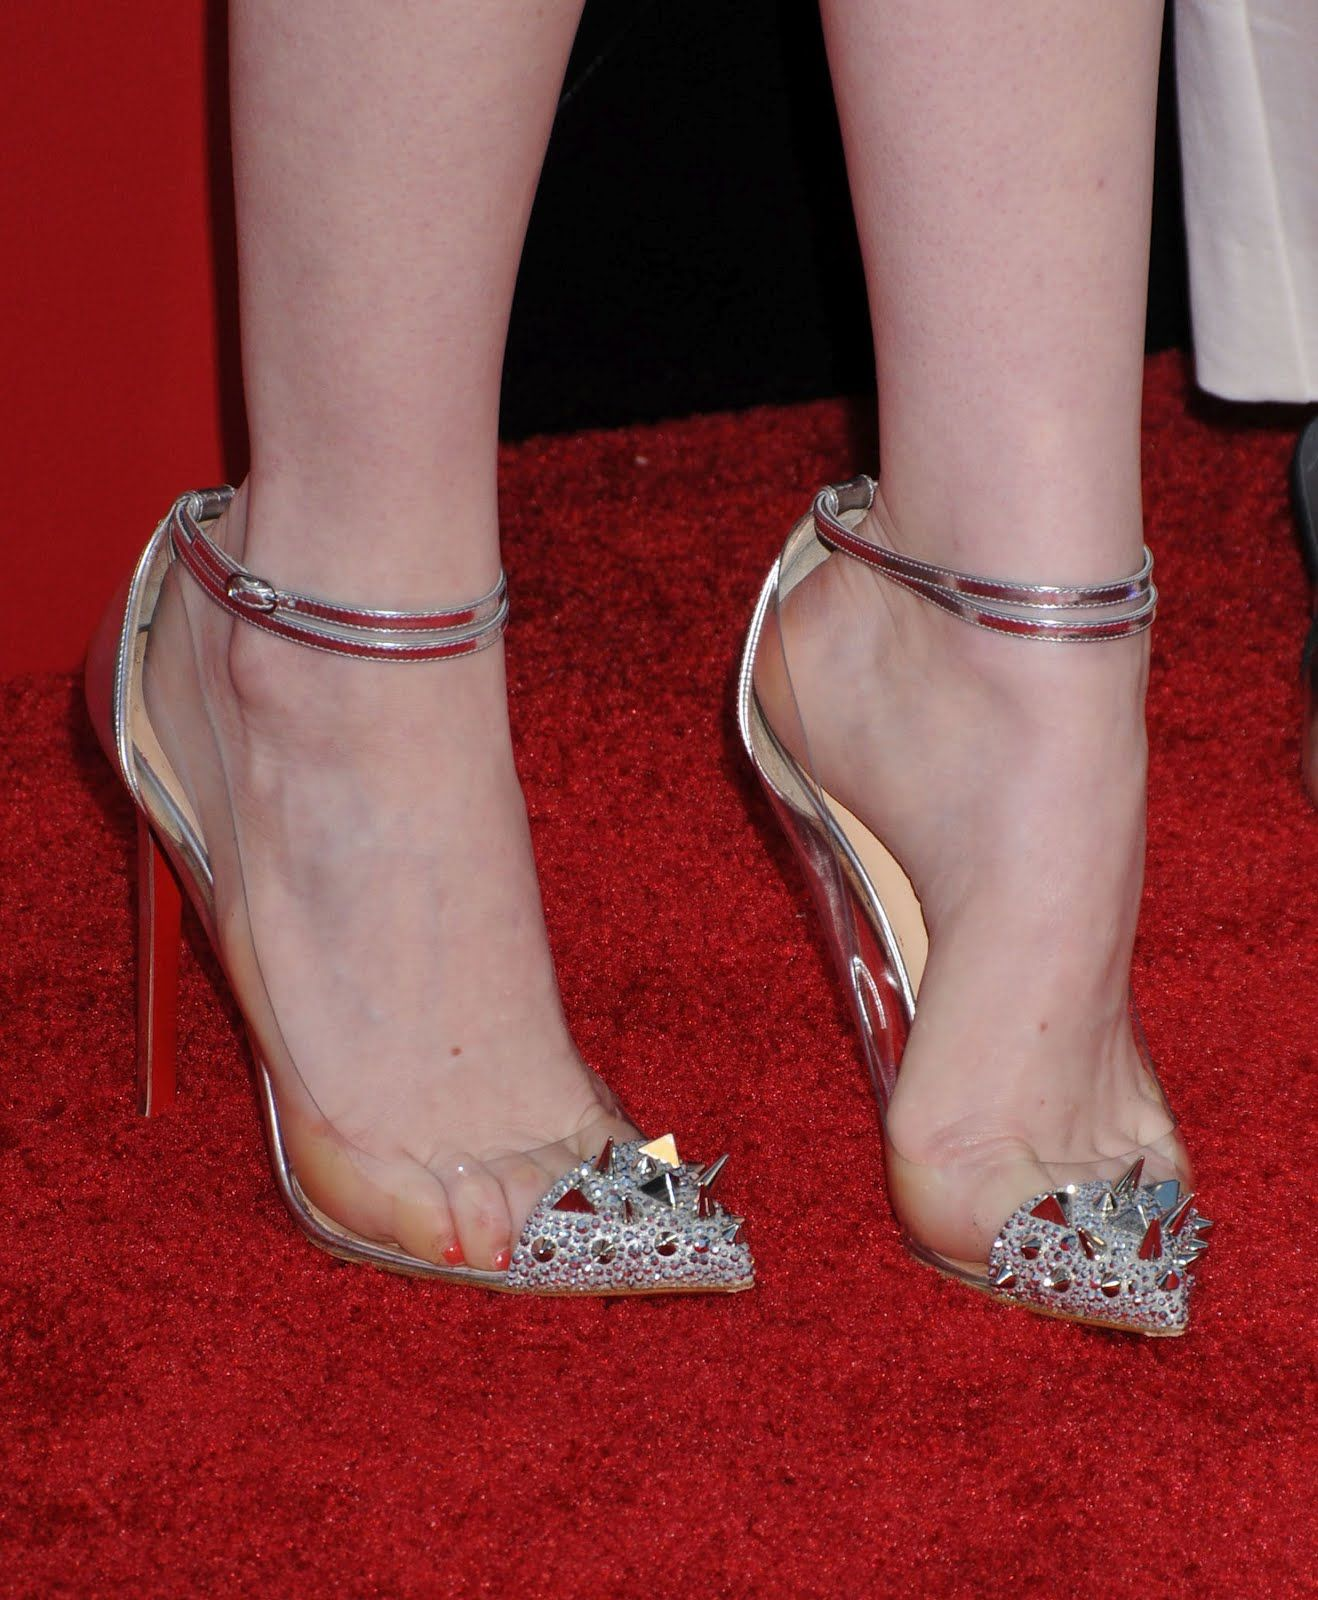 Pictures Natalie Portman nudes (97 photo), Sexy, Paparazzi, Boobs, legs 2015